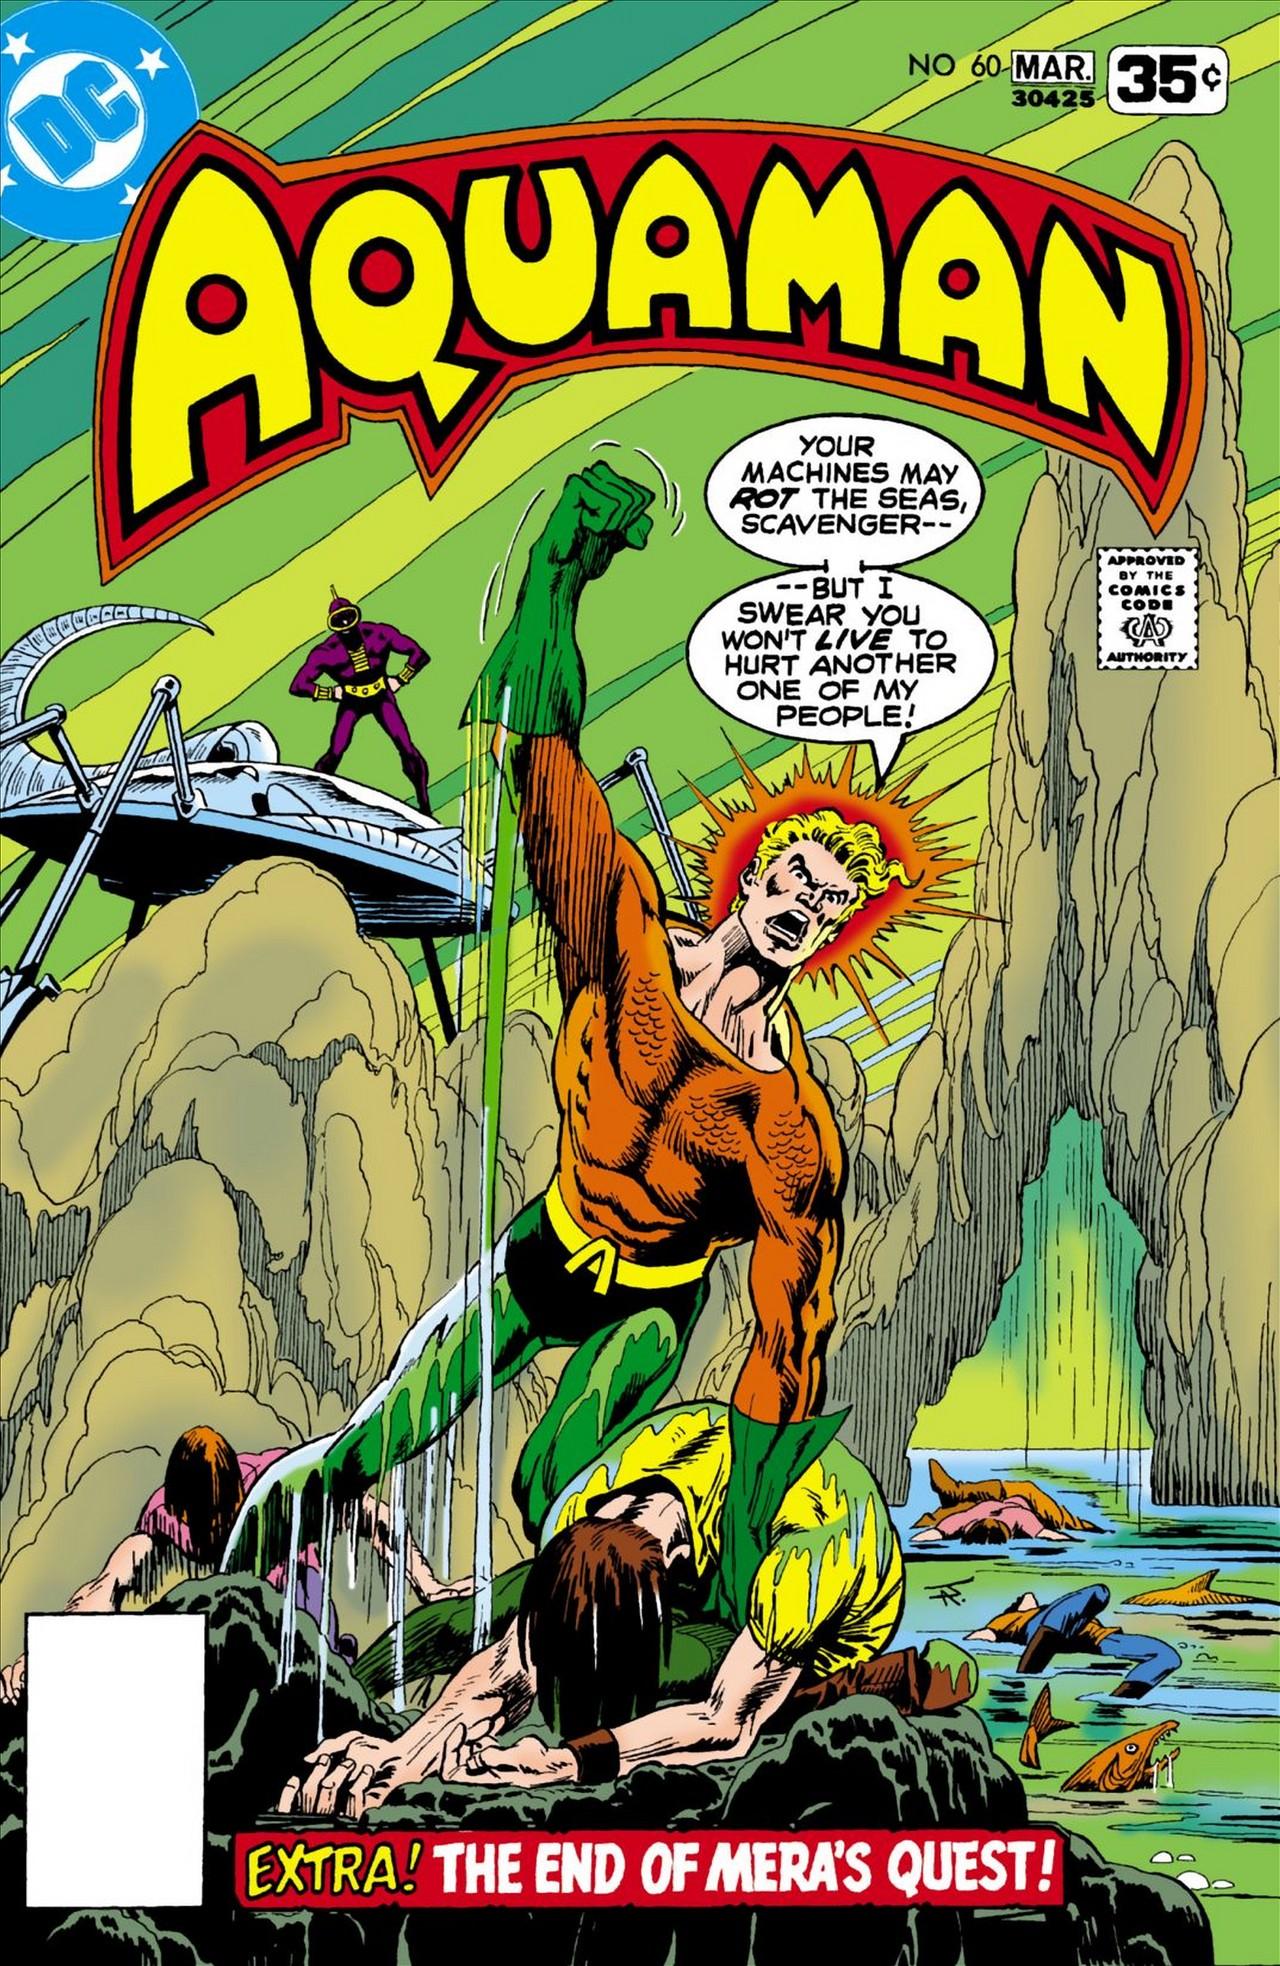 Read online Aquaman (1962) comic -  Issue #60 - 1